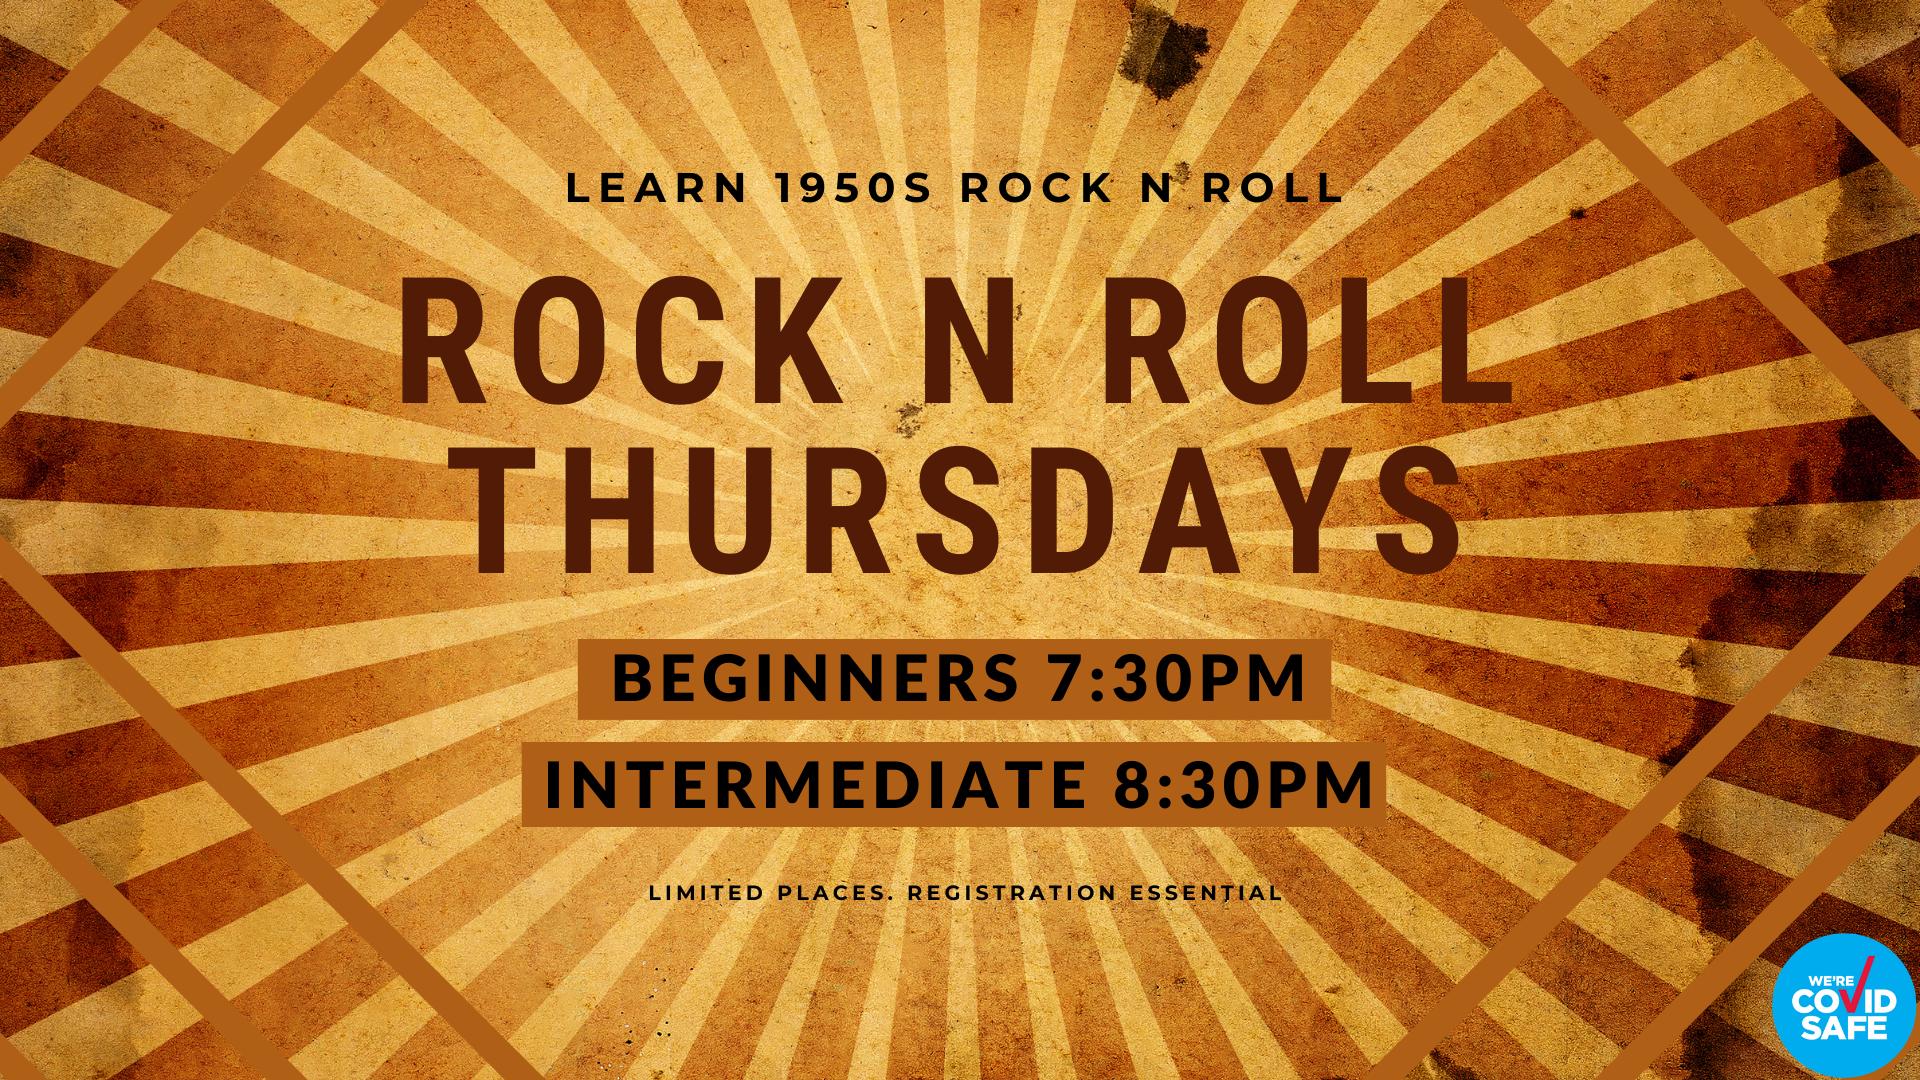 Thursday Rock n Roll - Both Classes